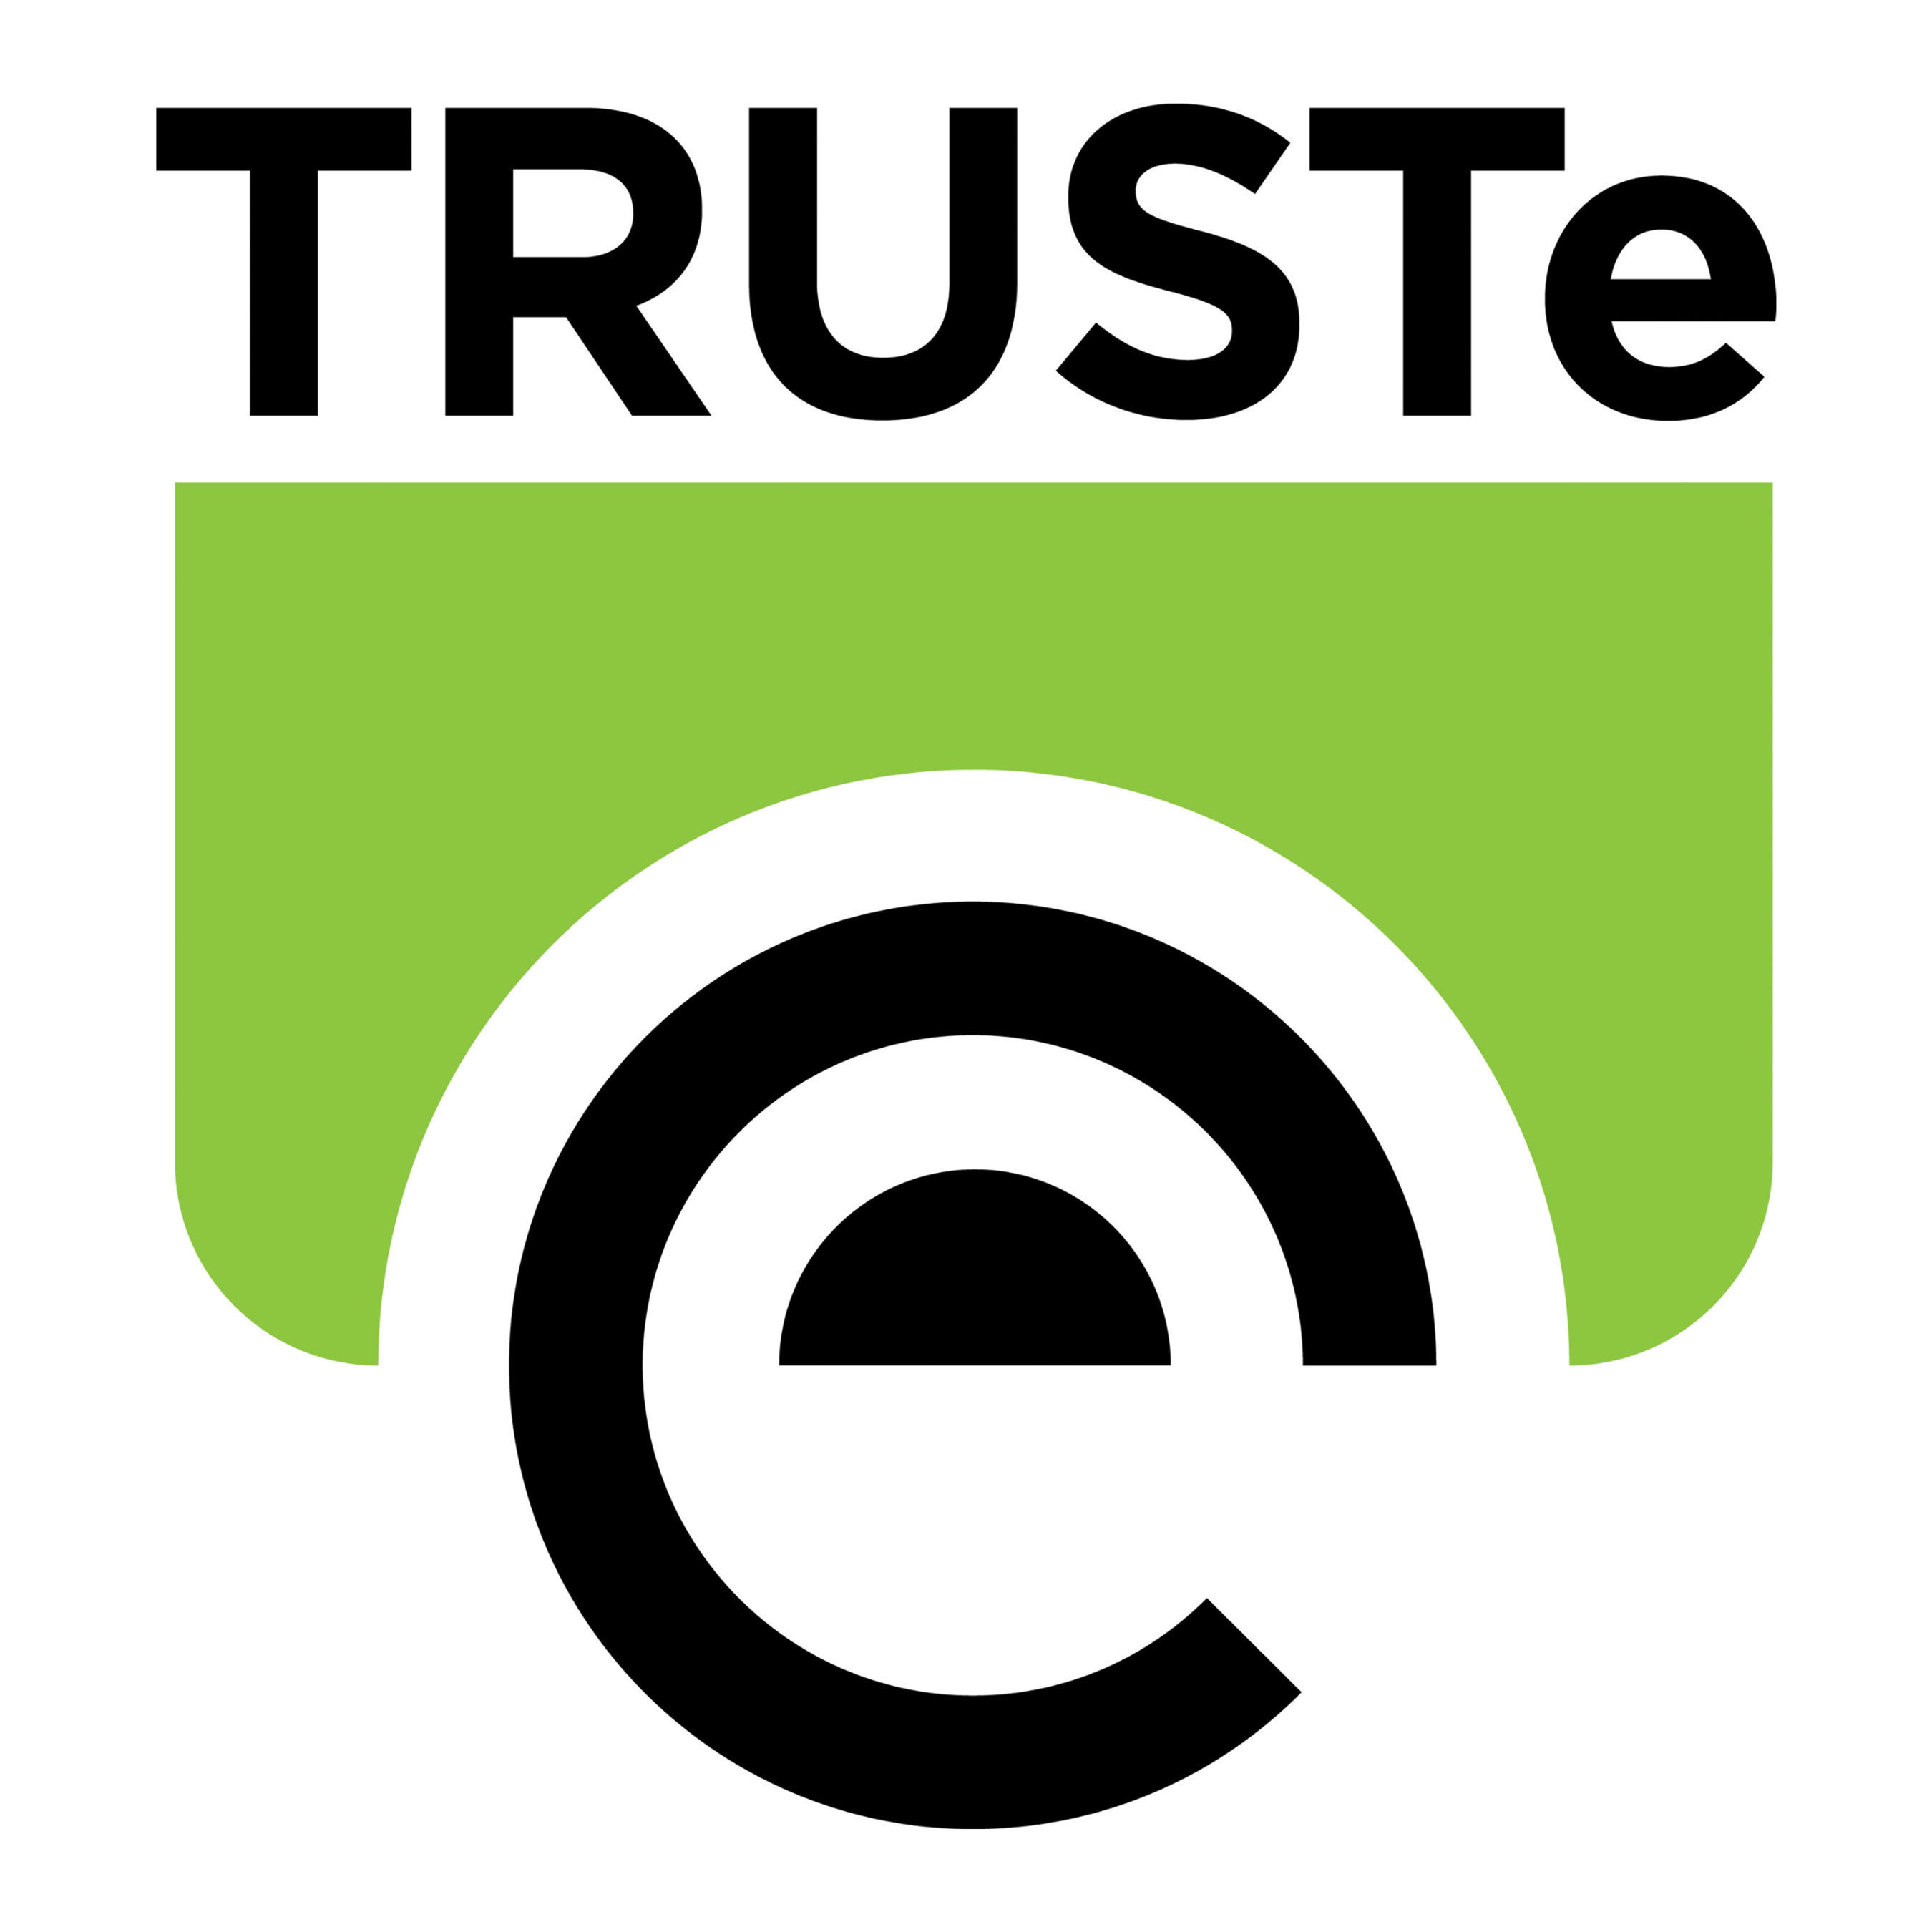 TRUSTe logo.